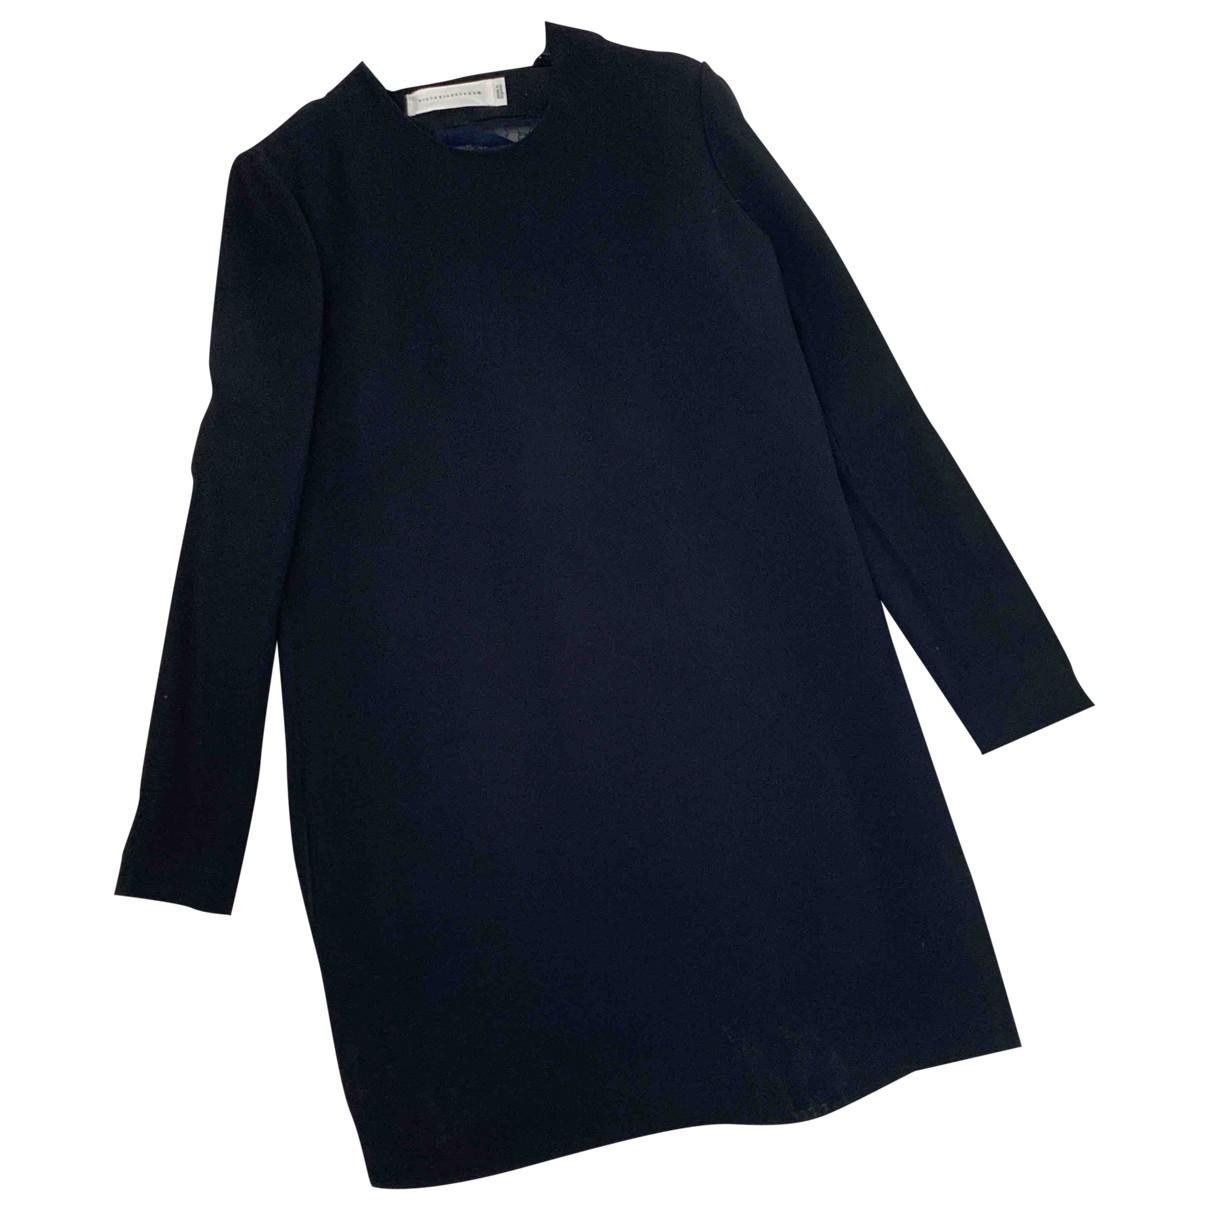 Victoria Beckham \N Black dress for Women 40 FR